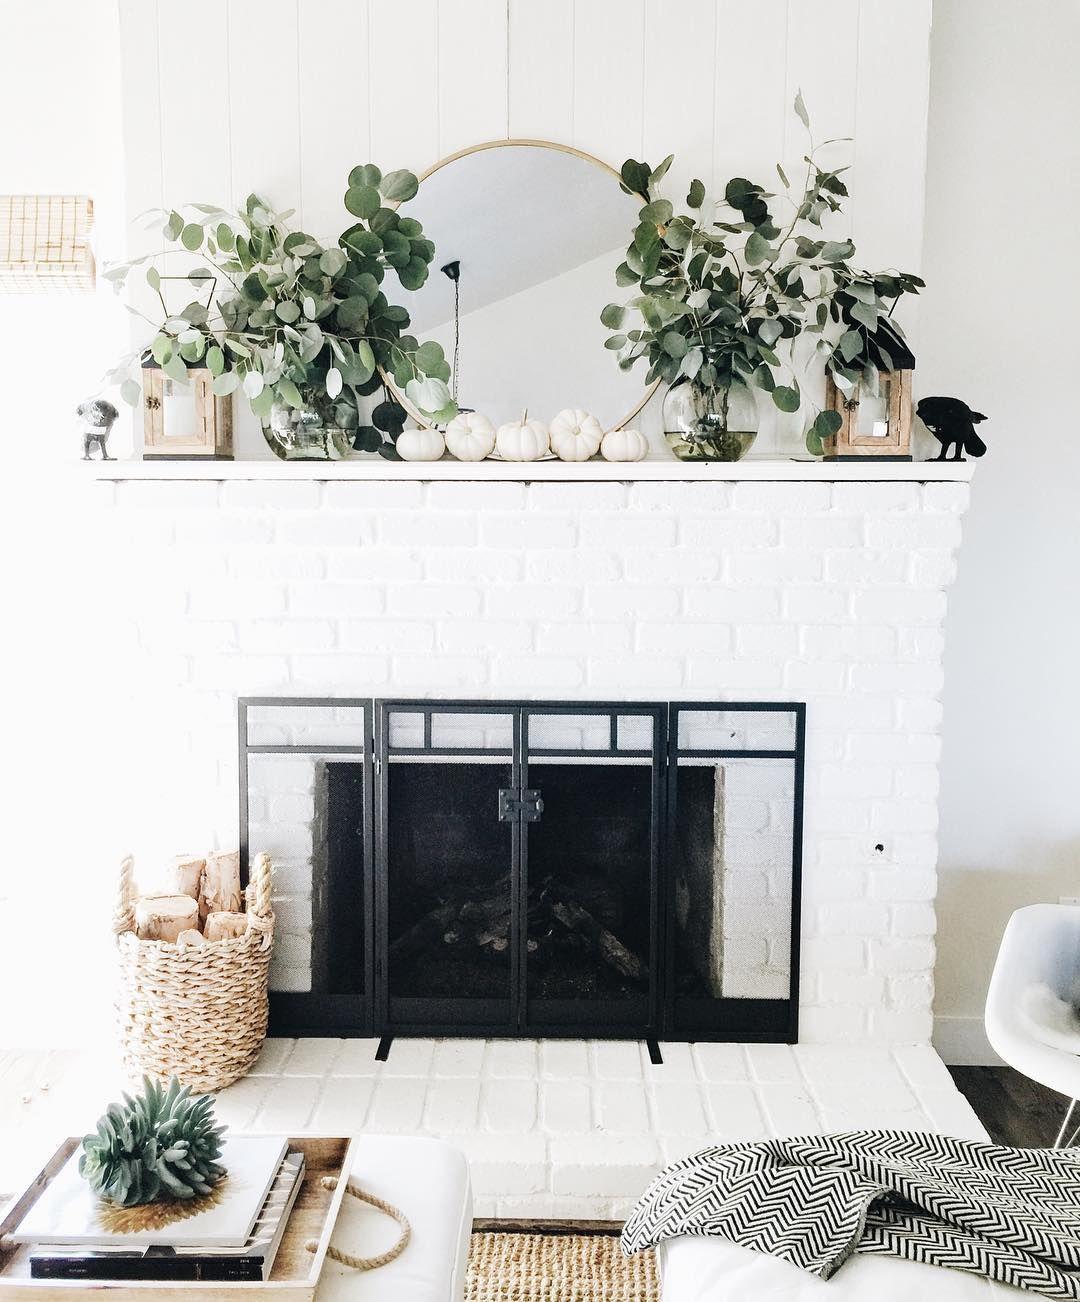 Instagram White Brick Fireplace Fall Home Decor Fall Fireplace